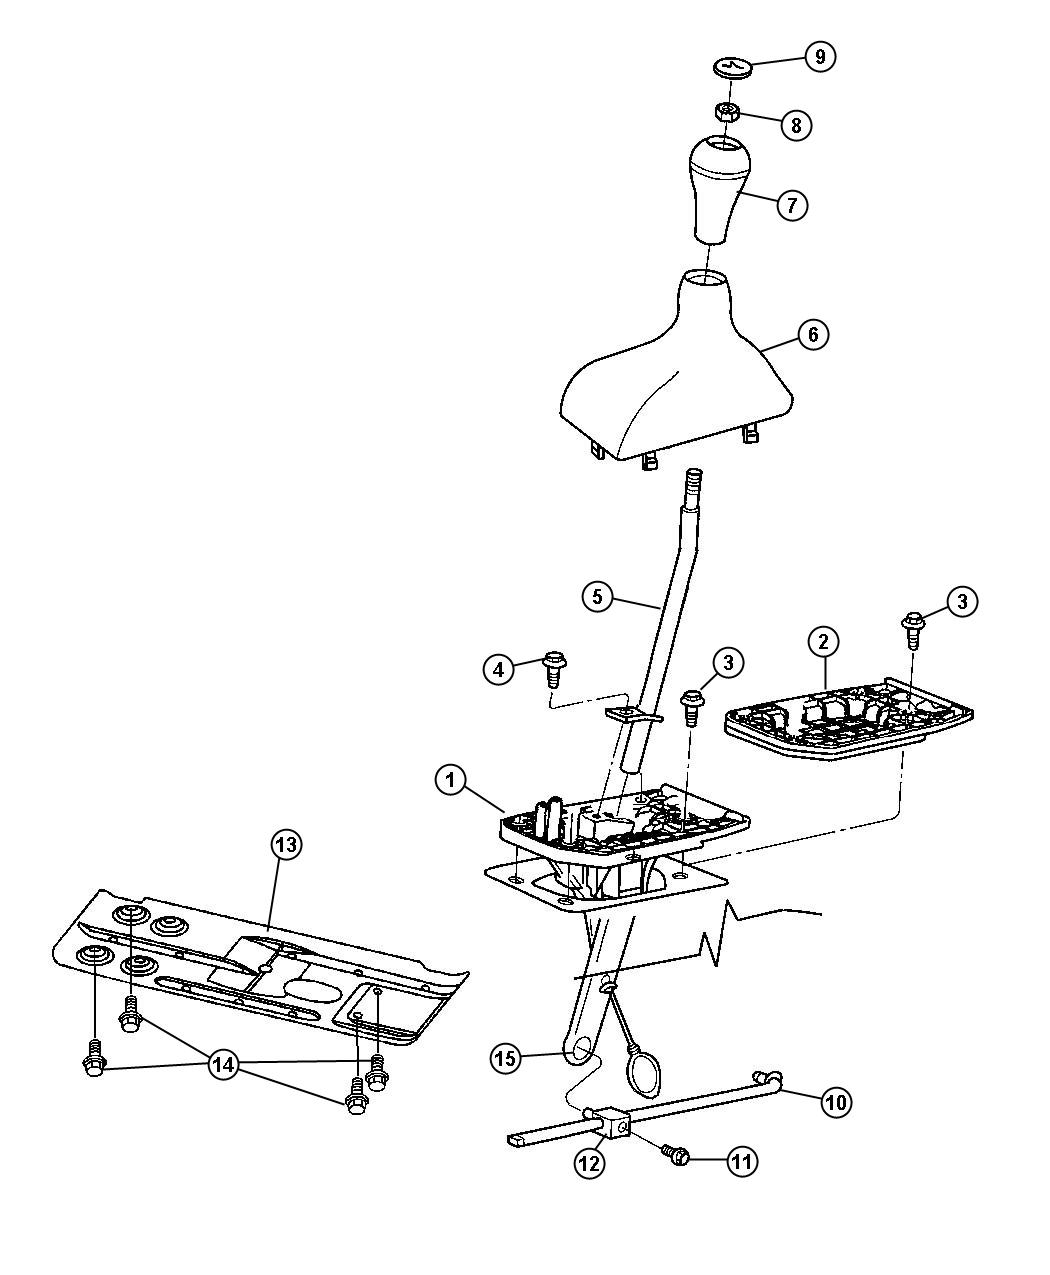 Dodge Ram Rod Gear Shift Control Transfer Case Length 16 Inches